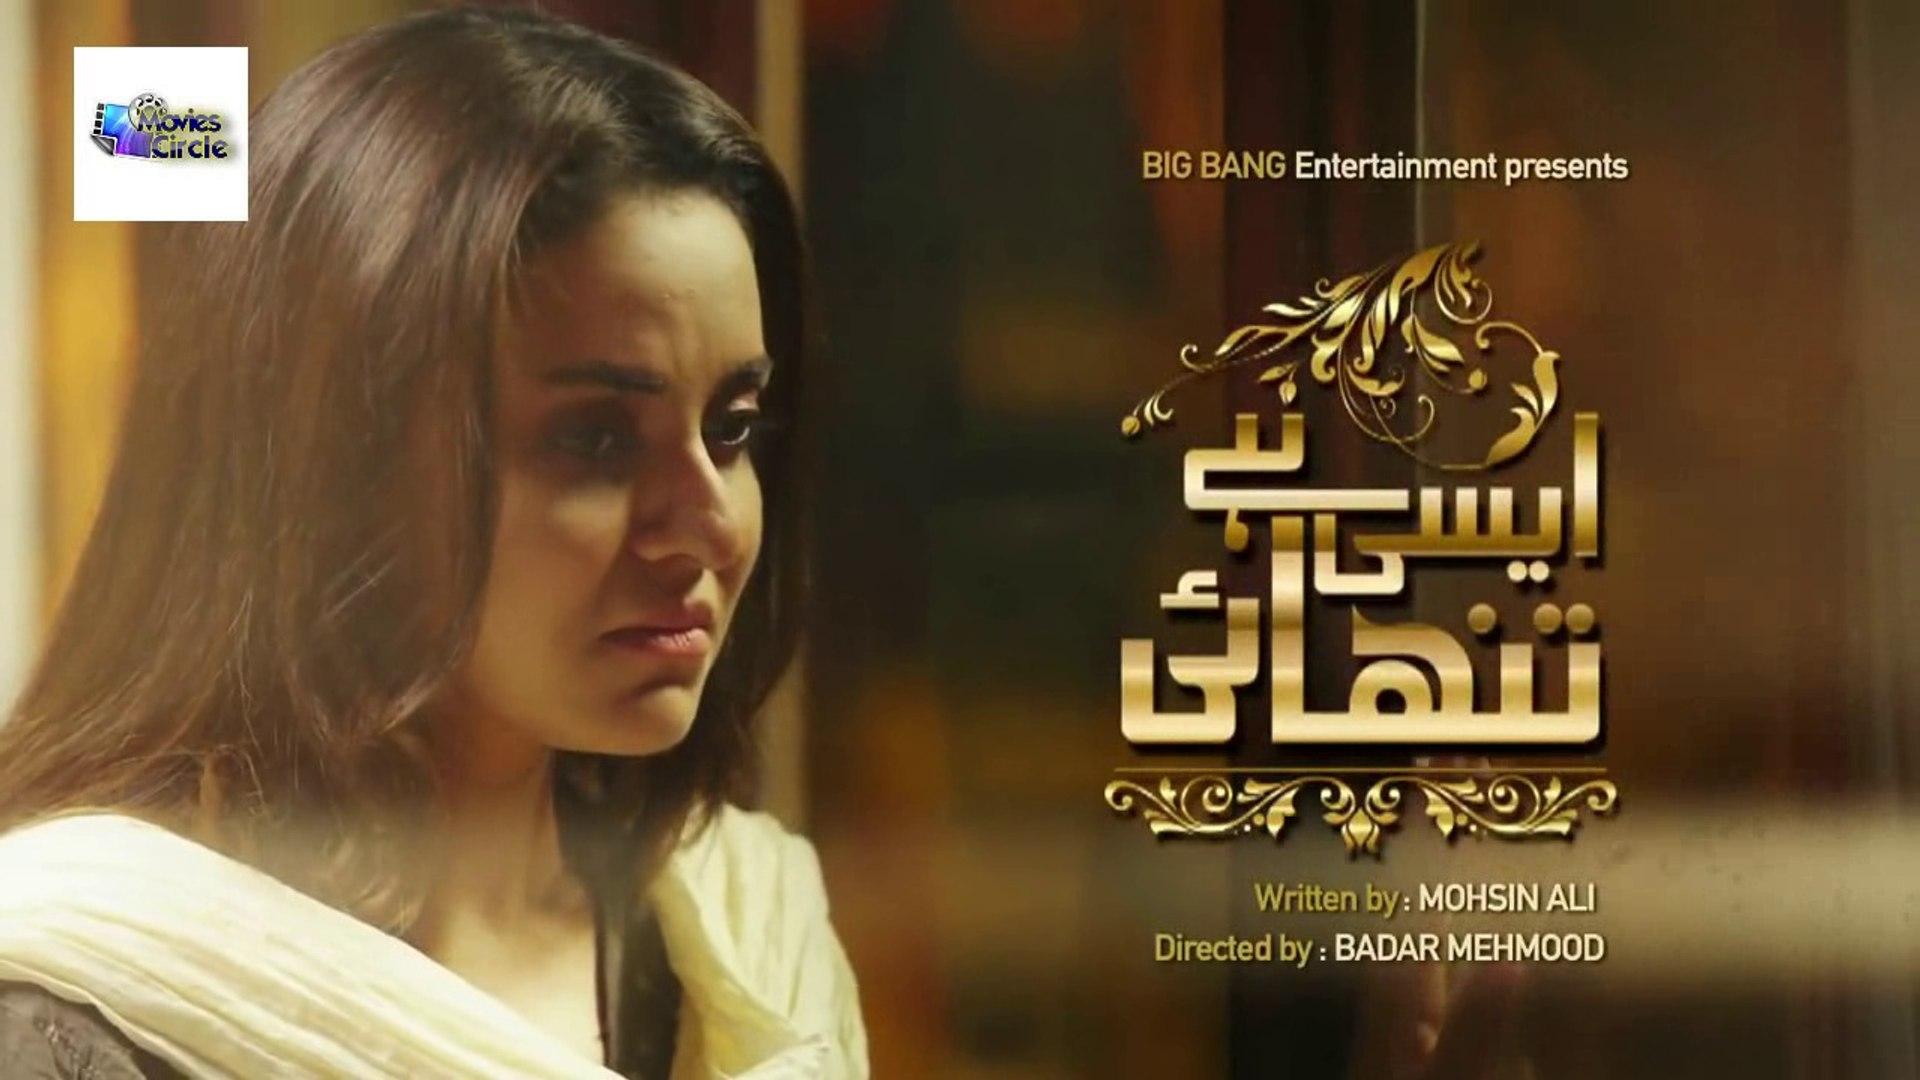 New Drama - Aisi hay Tanhai - Episode 27 - Movies Circle